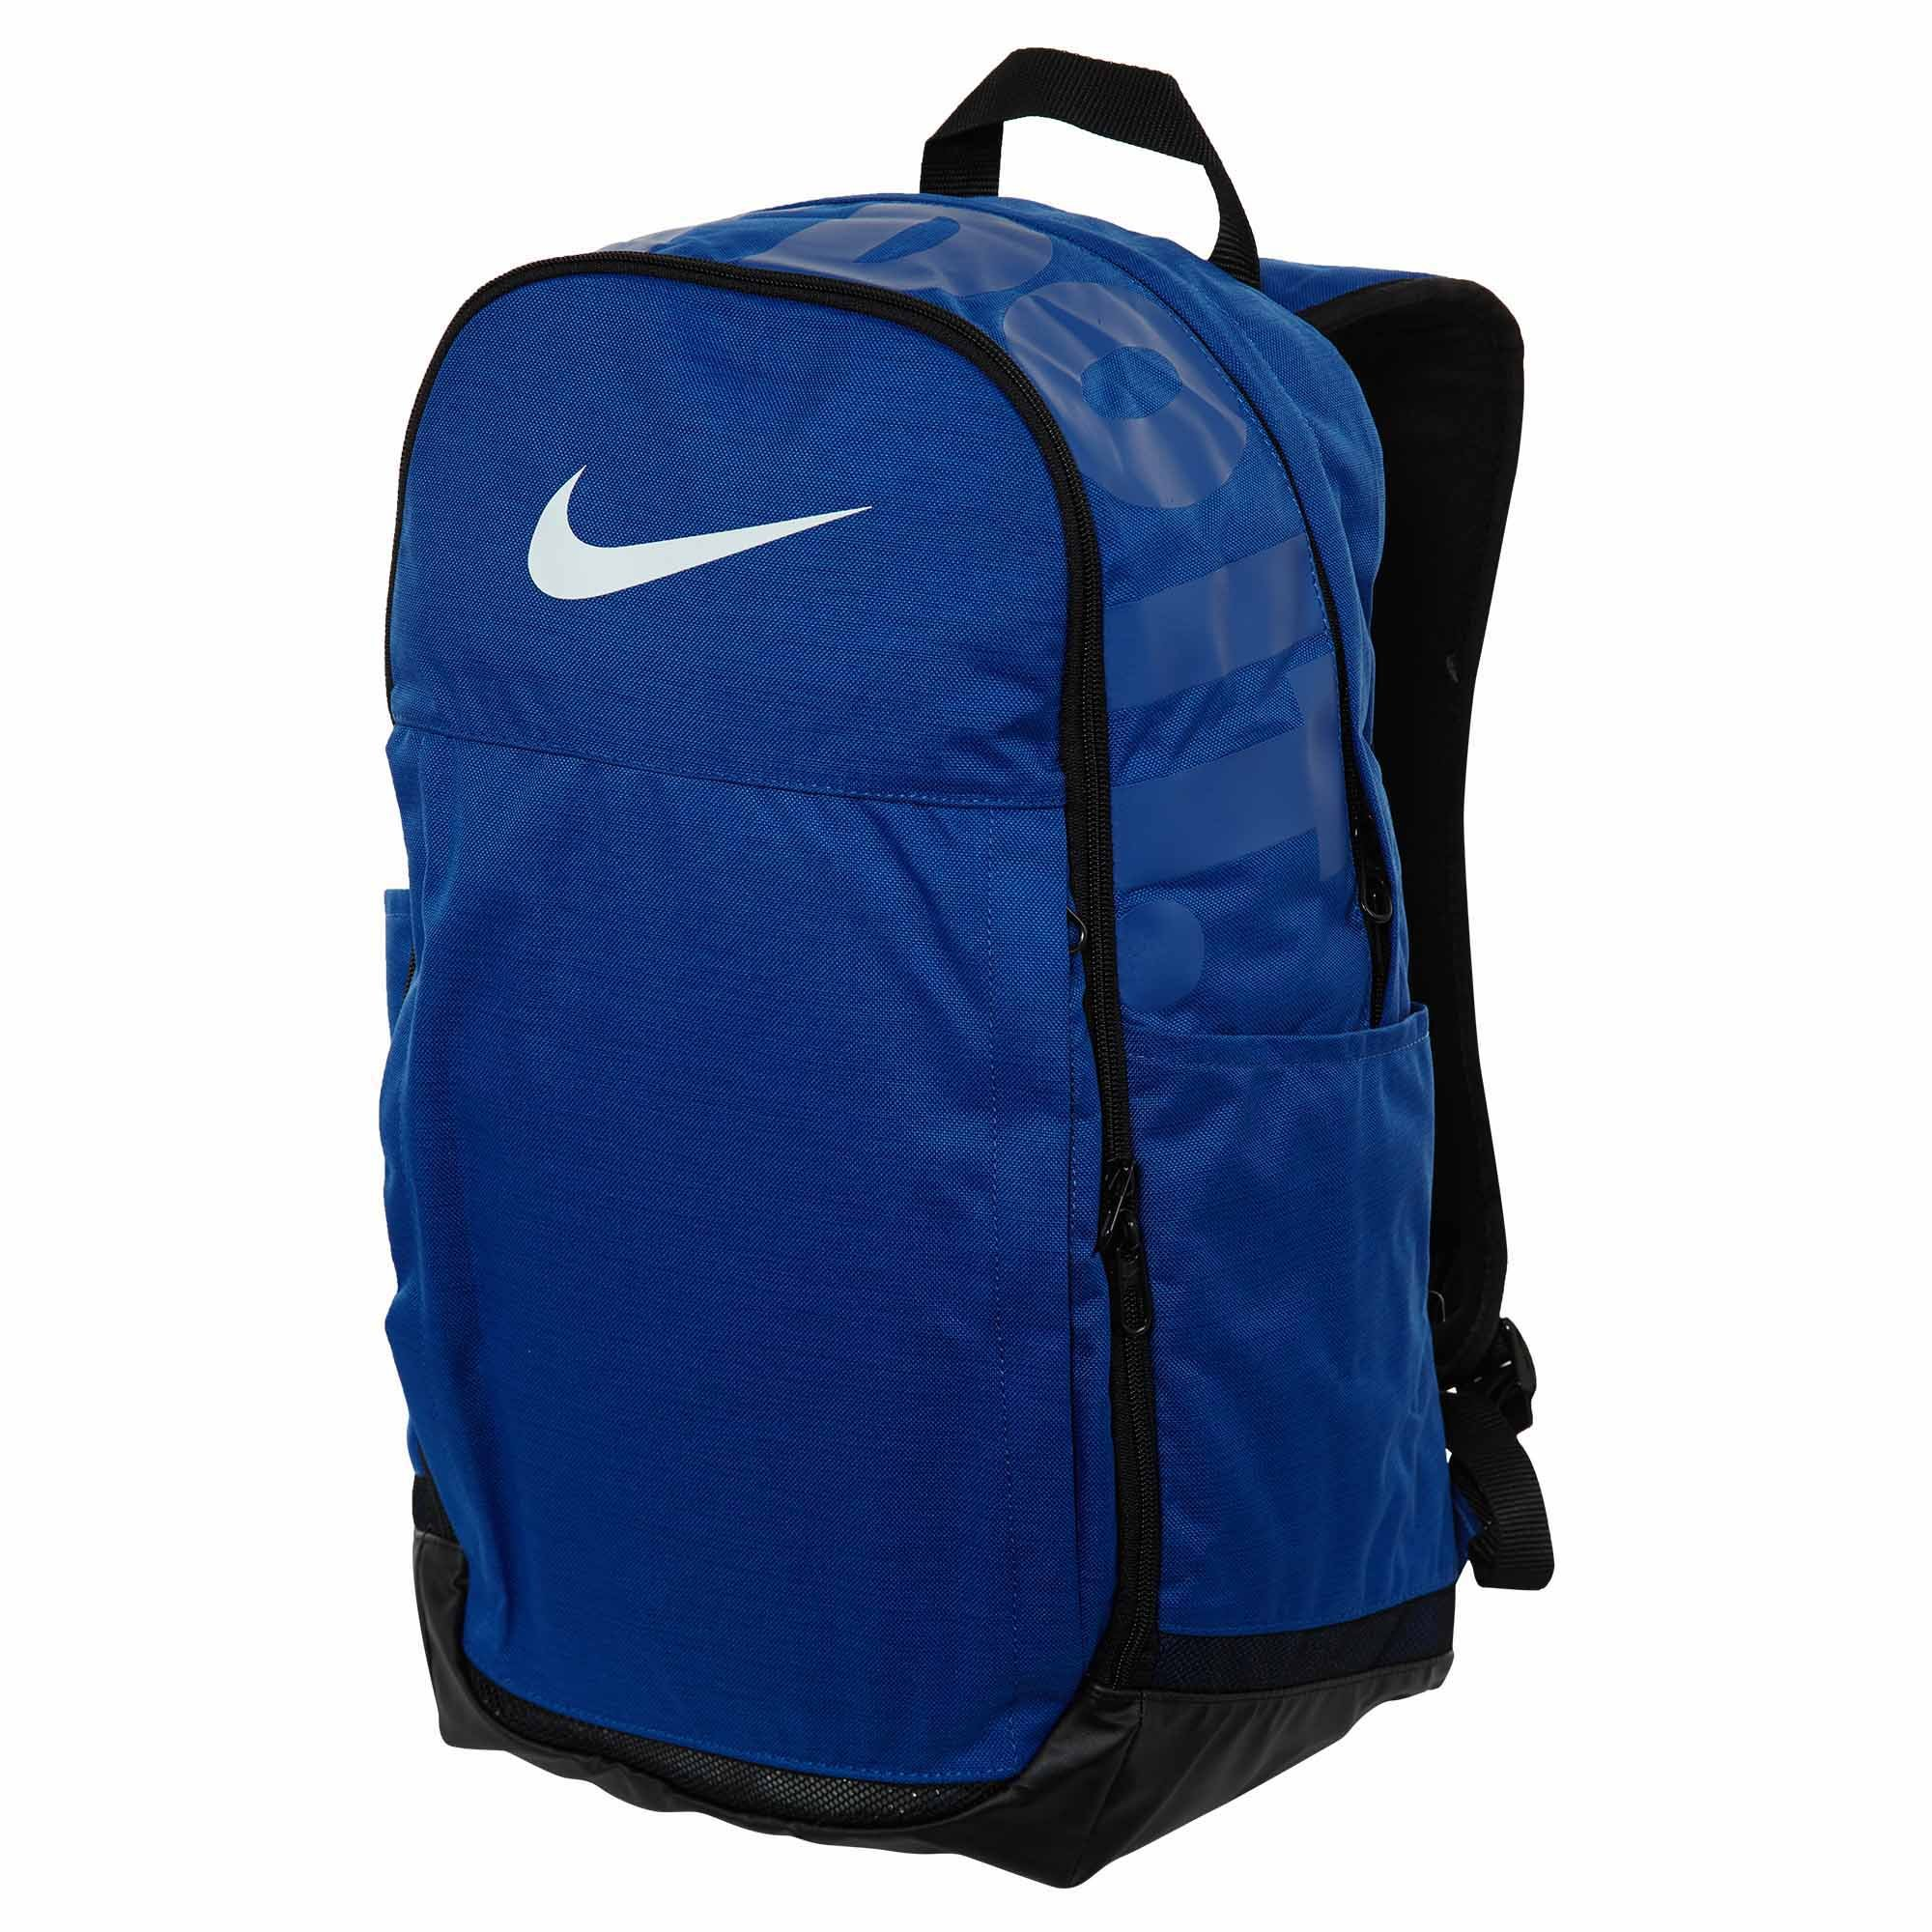 Galleon - Nike Brasilia (Extra-Large) Blue Black Training Backpack b20ca3e45f6f9